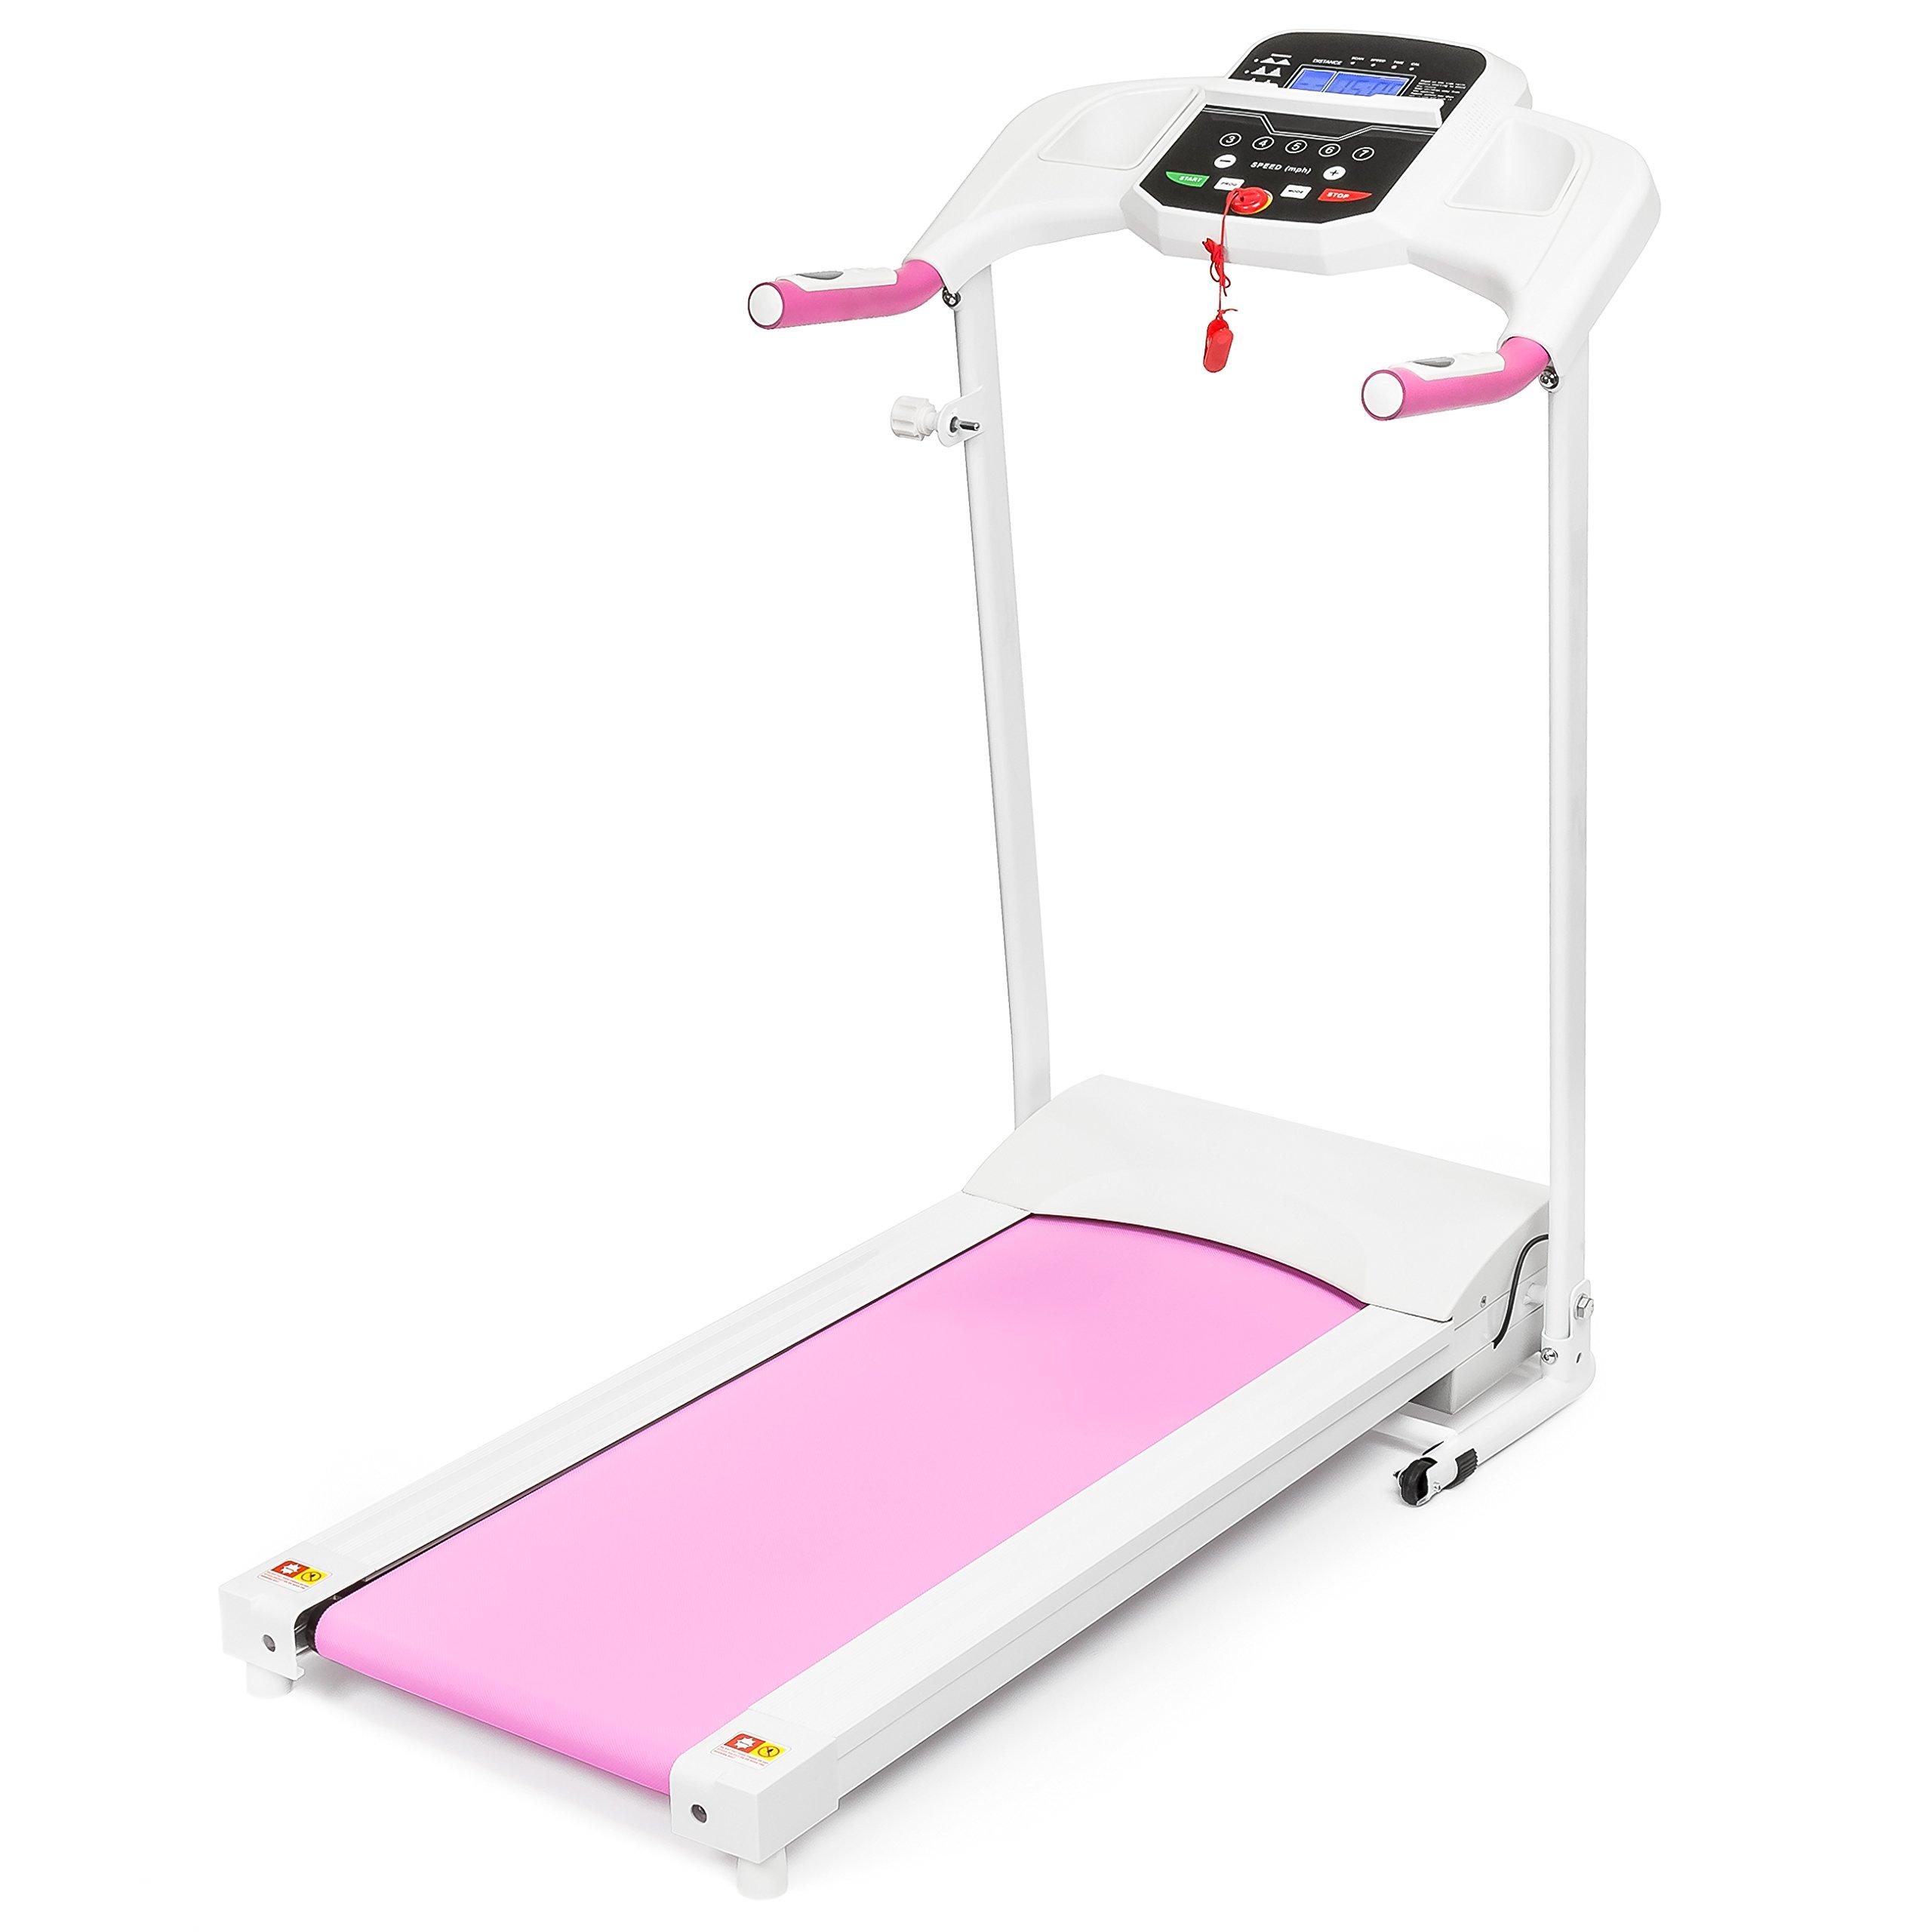 Best Choice Products 5 Speed Treadmill w/Water Bottle Holder, Media Shelf (Pink)